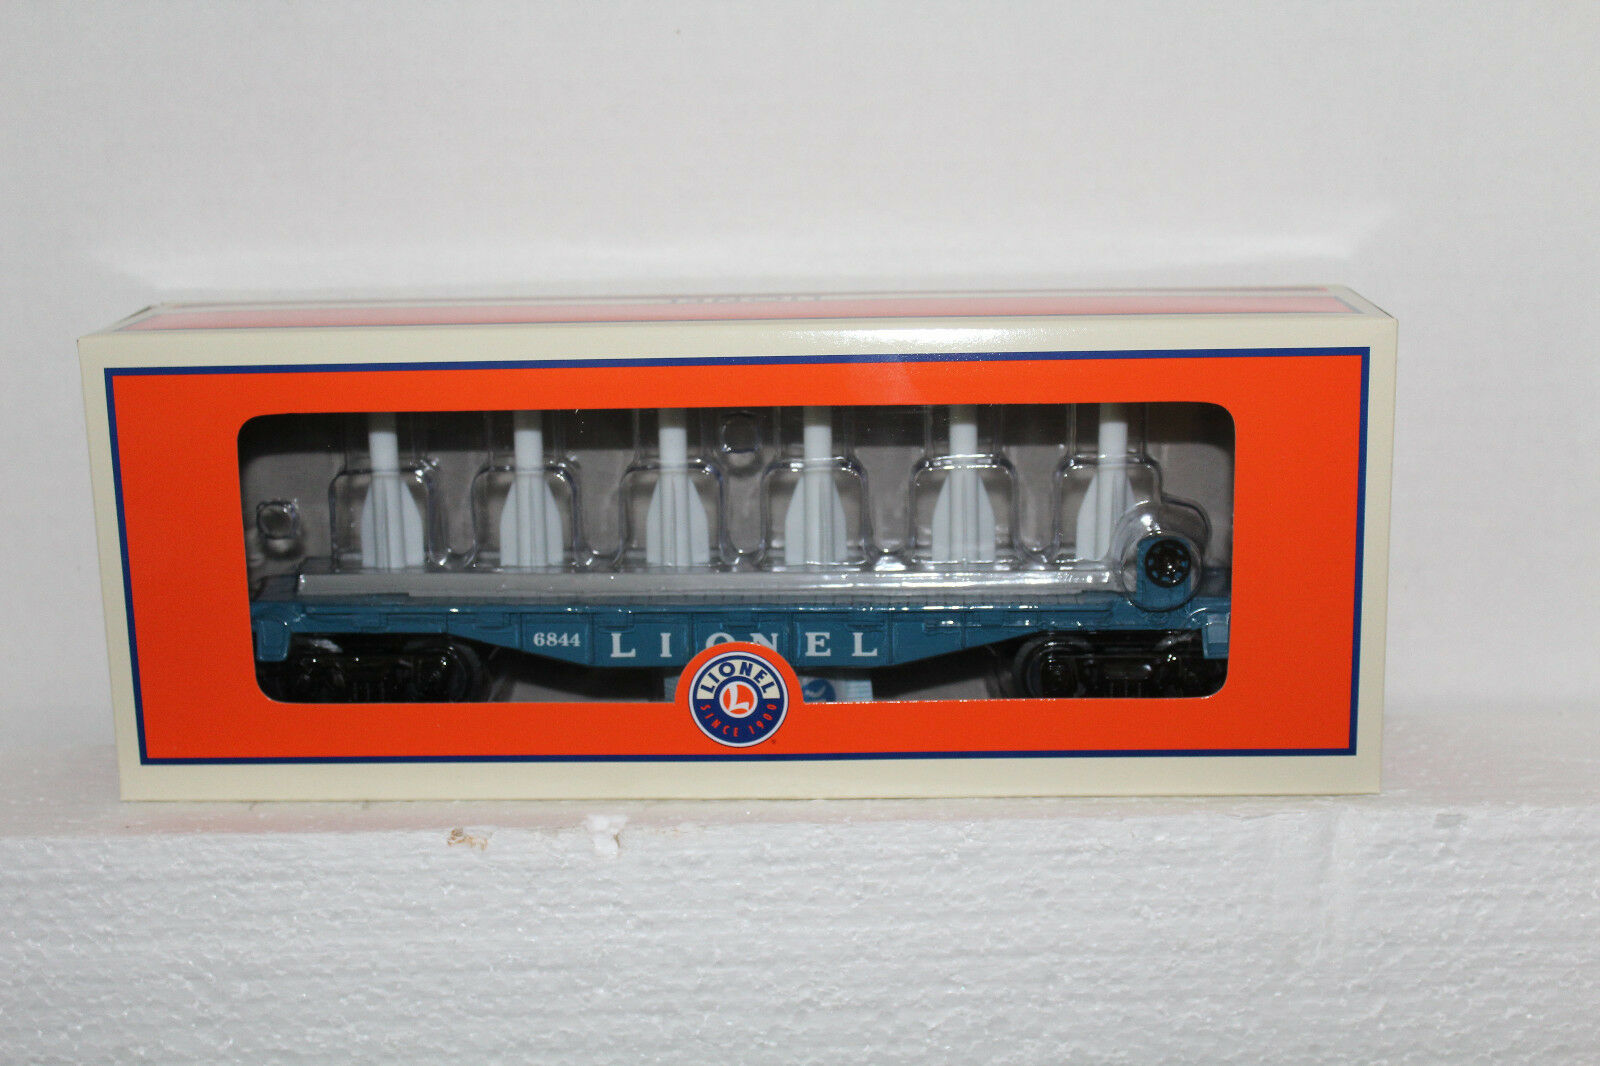 Lionel  81493 Lionel missile carrying car